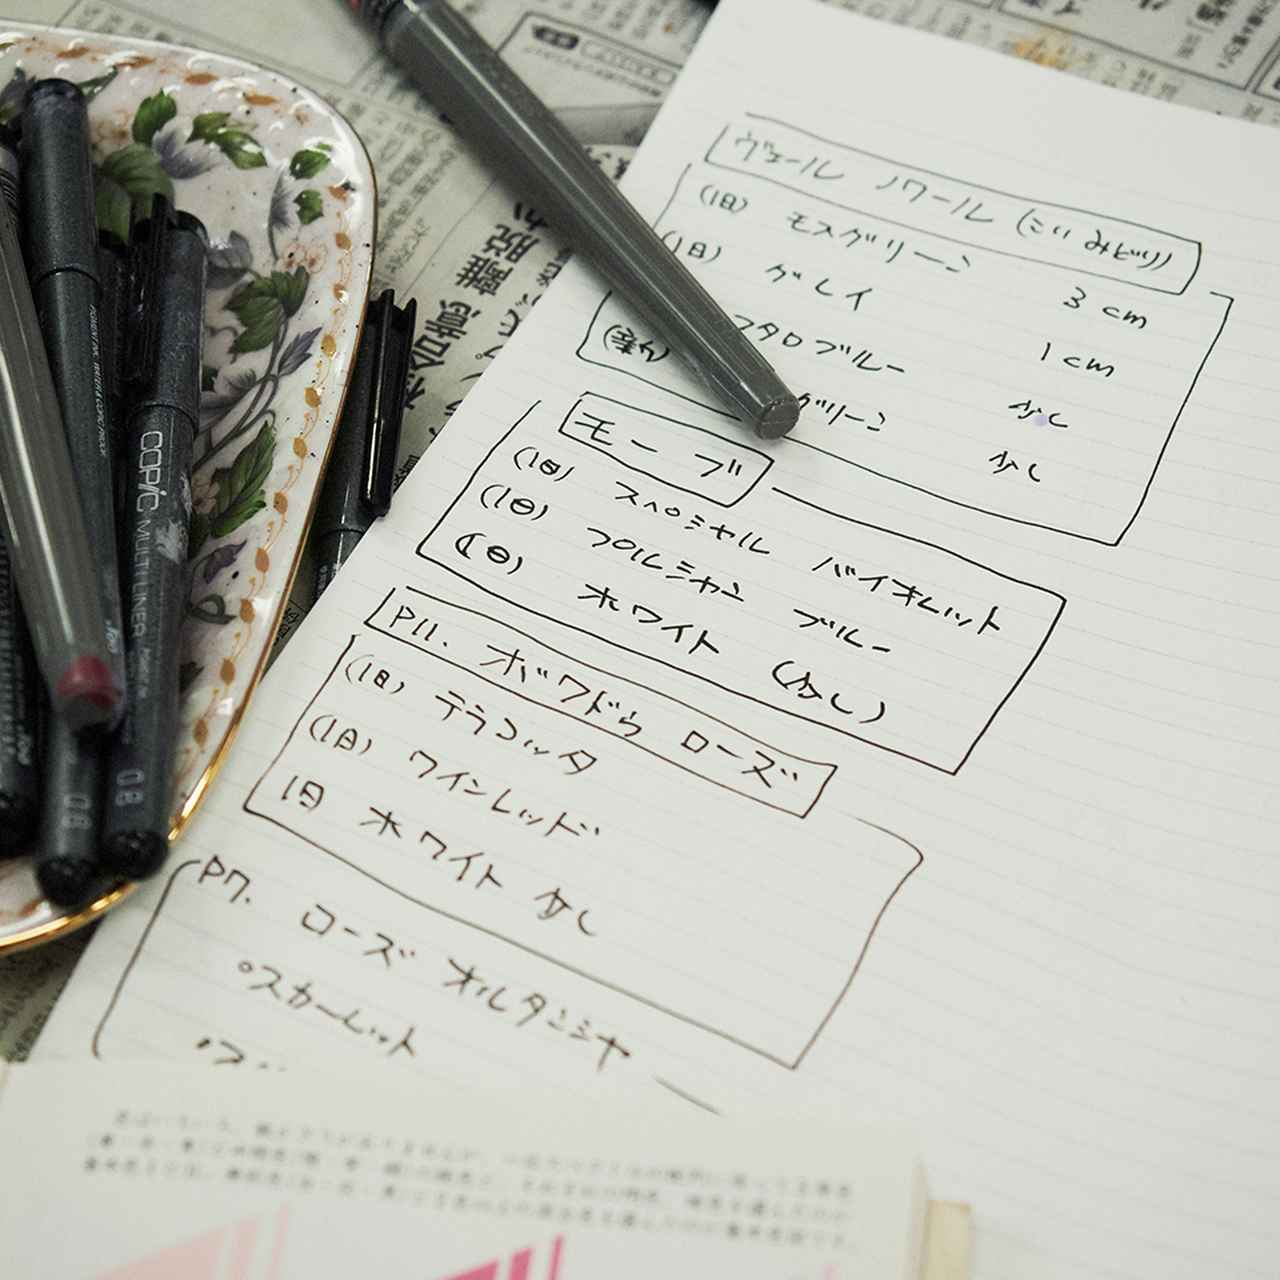 Images : 8番目の画像 - 「スペシャル インタビュー 漫画家・荒木飛呂彦の化学反応」のアルバム - T JAPAN:The New York Times Style Magazine 公式サイト